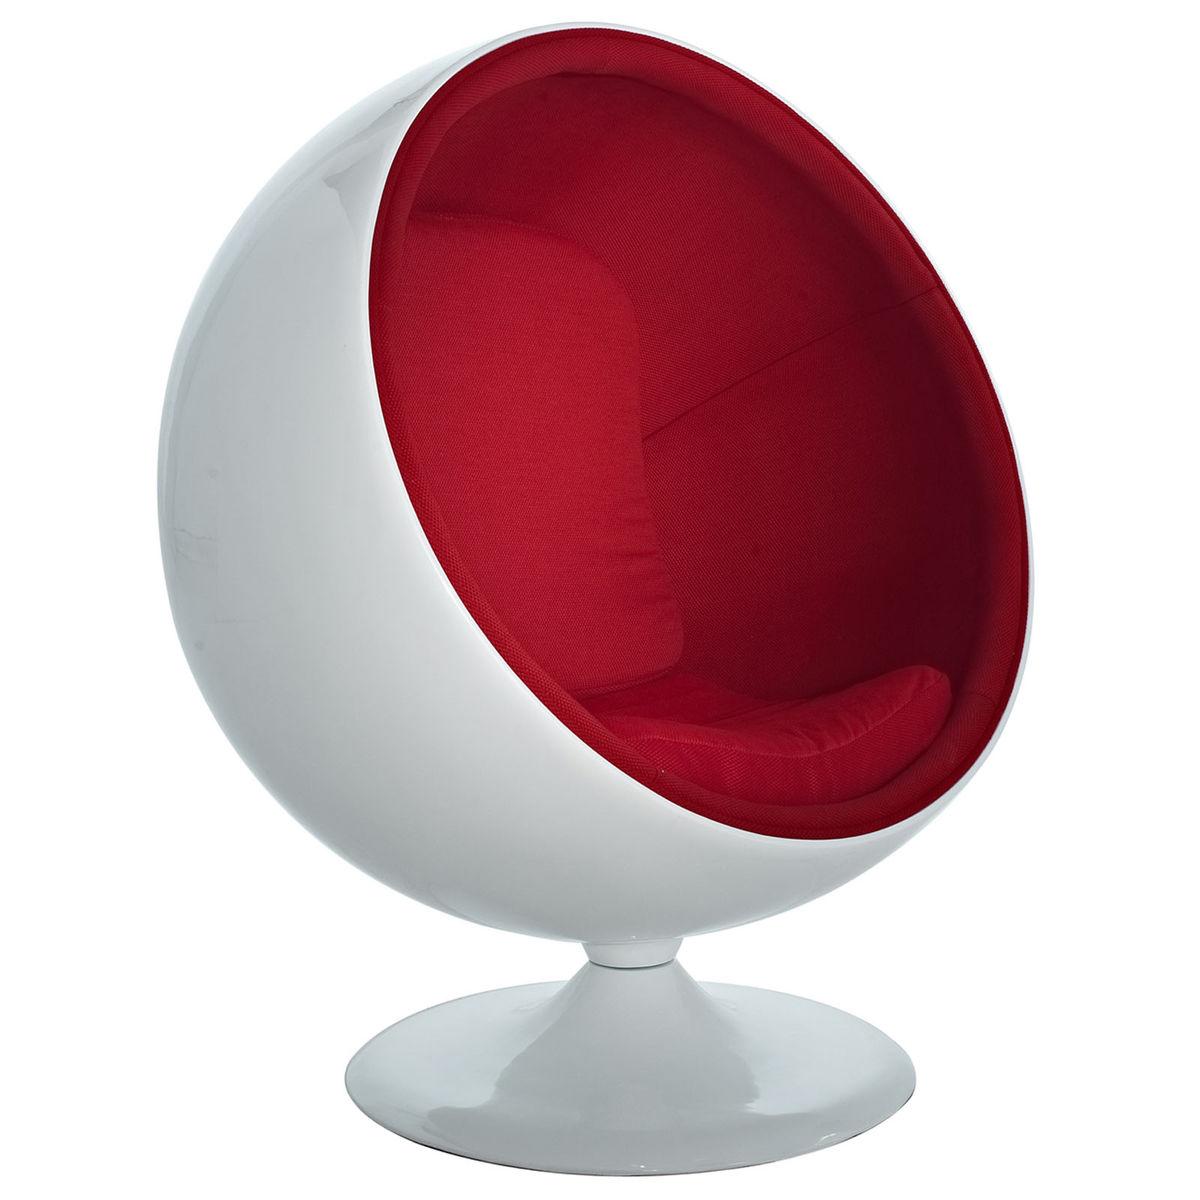 Eero Aarnio Ball Chair  Modern Reproduction chair